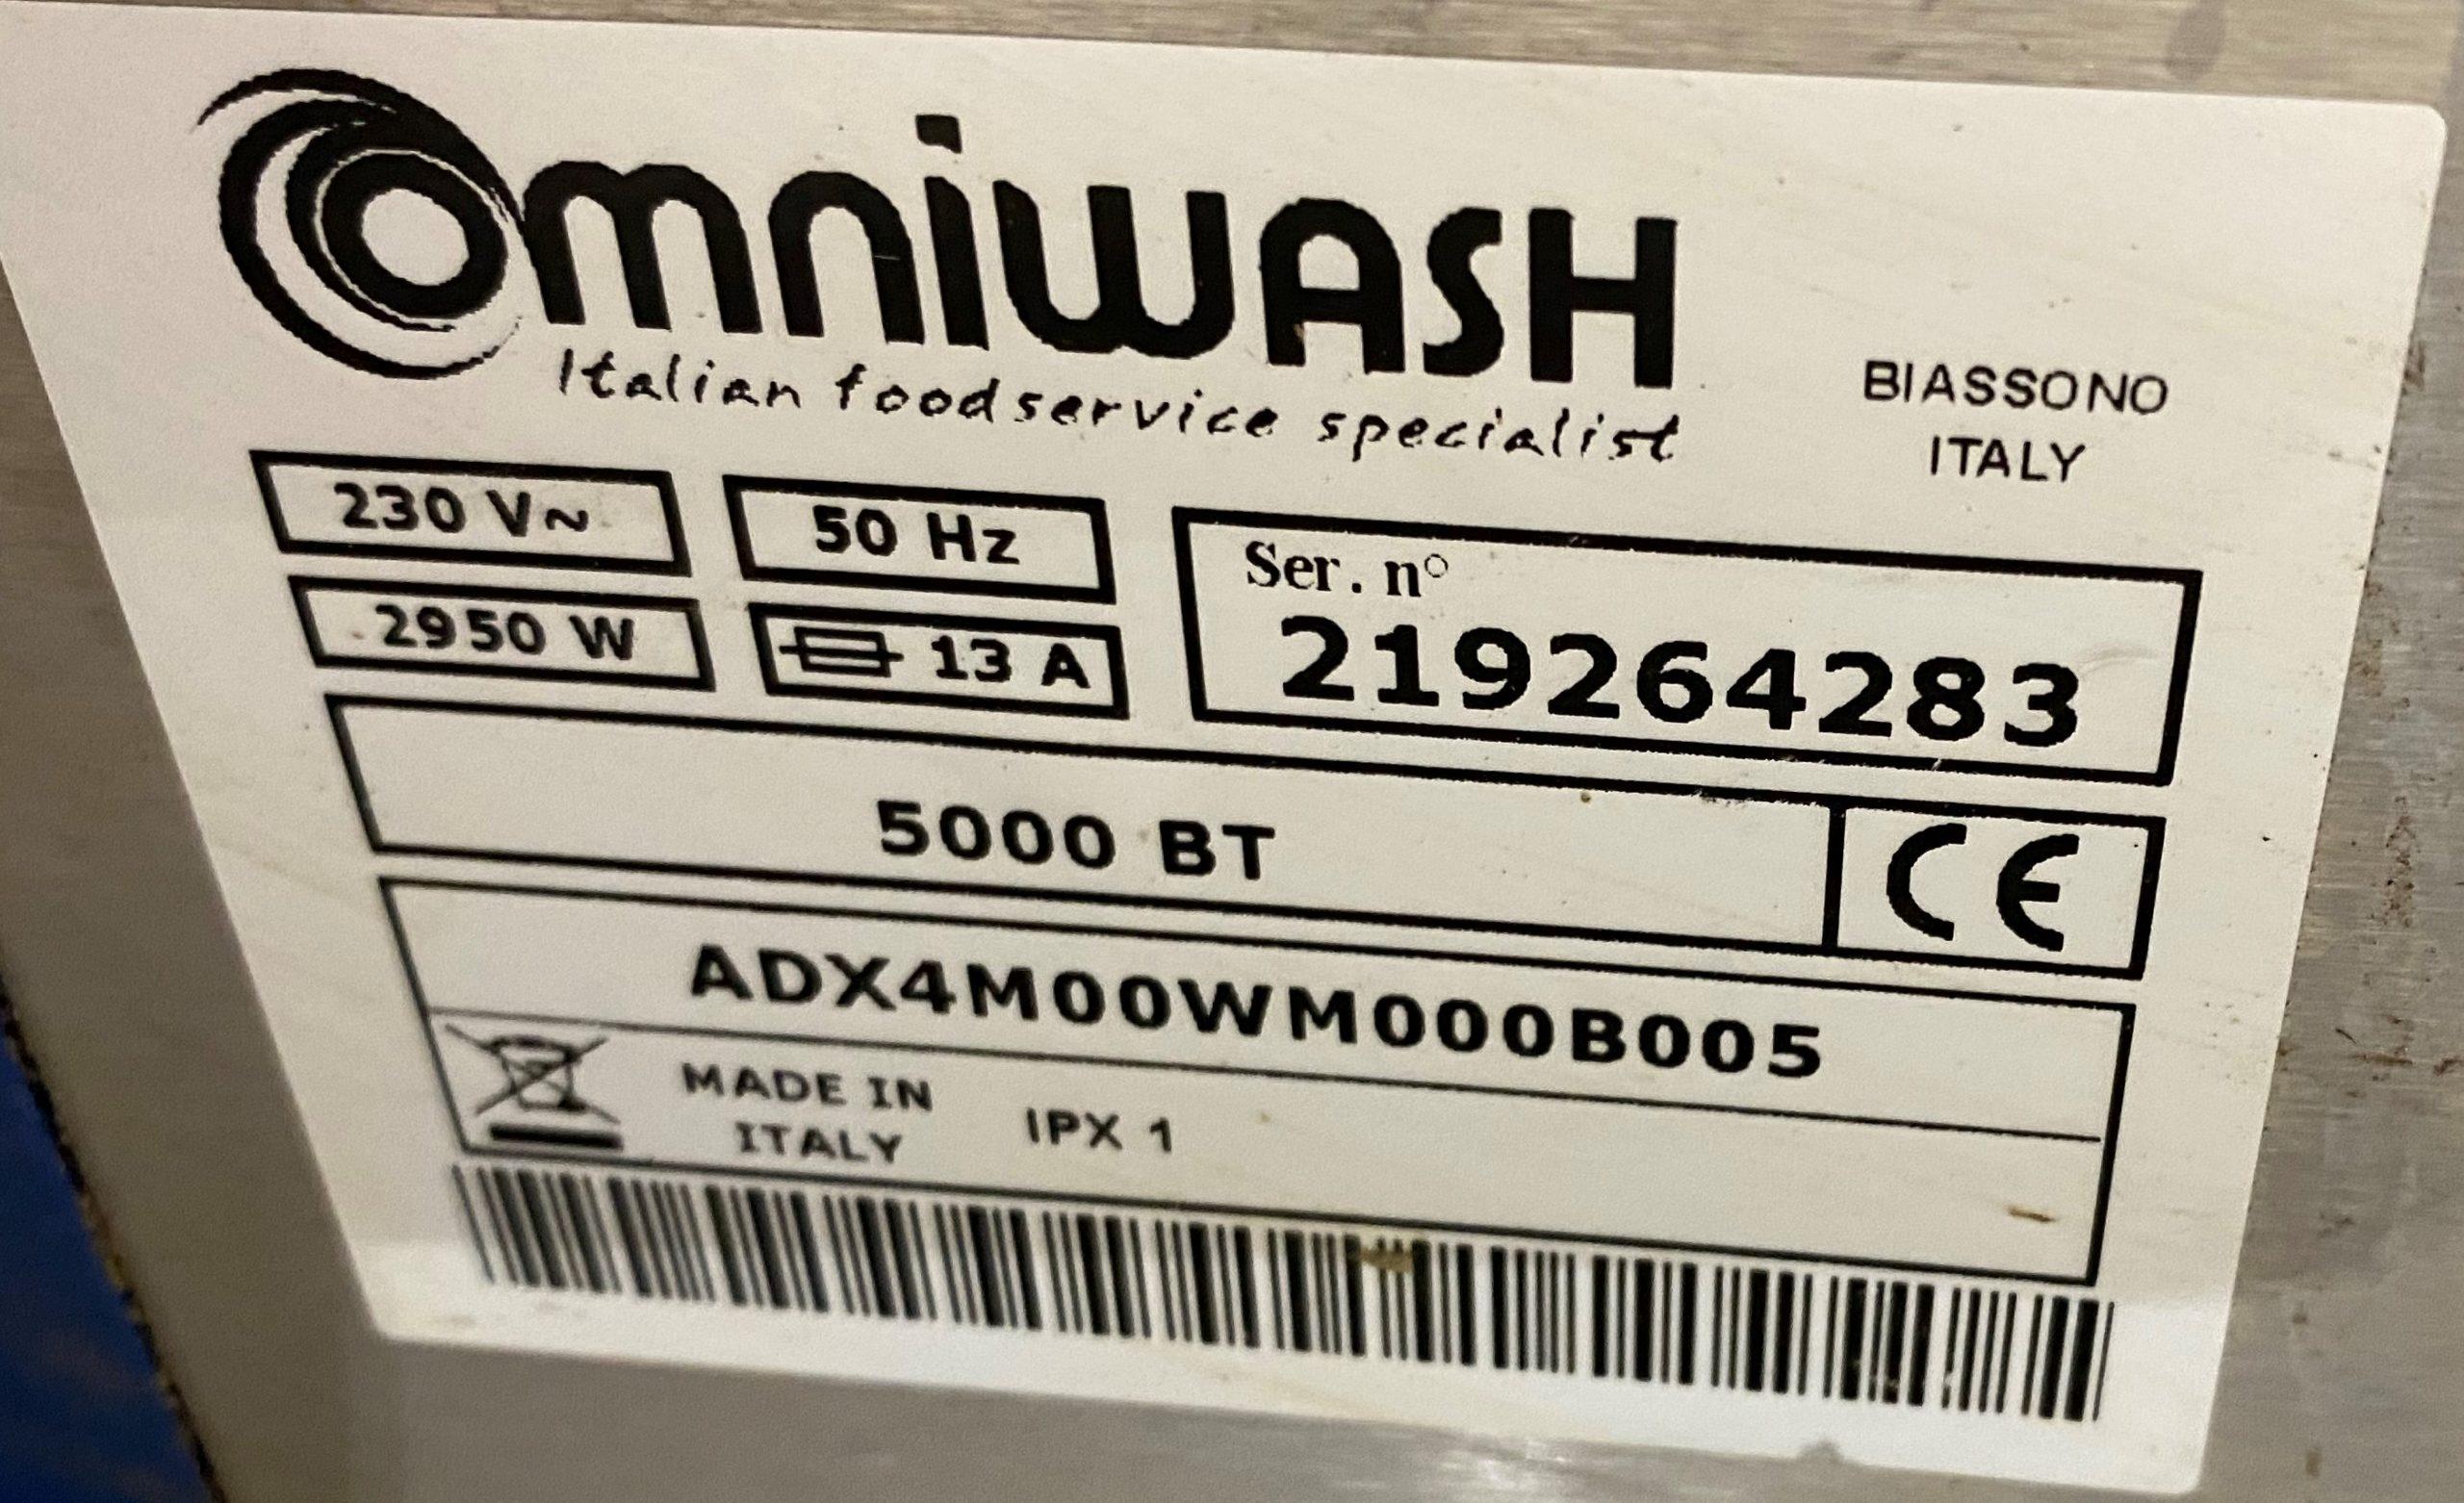 ADEXA Omniwash 5000BT Under Counter Dish Washer – 13 amp